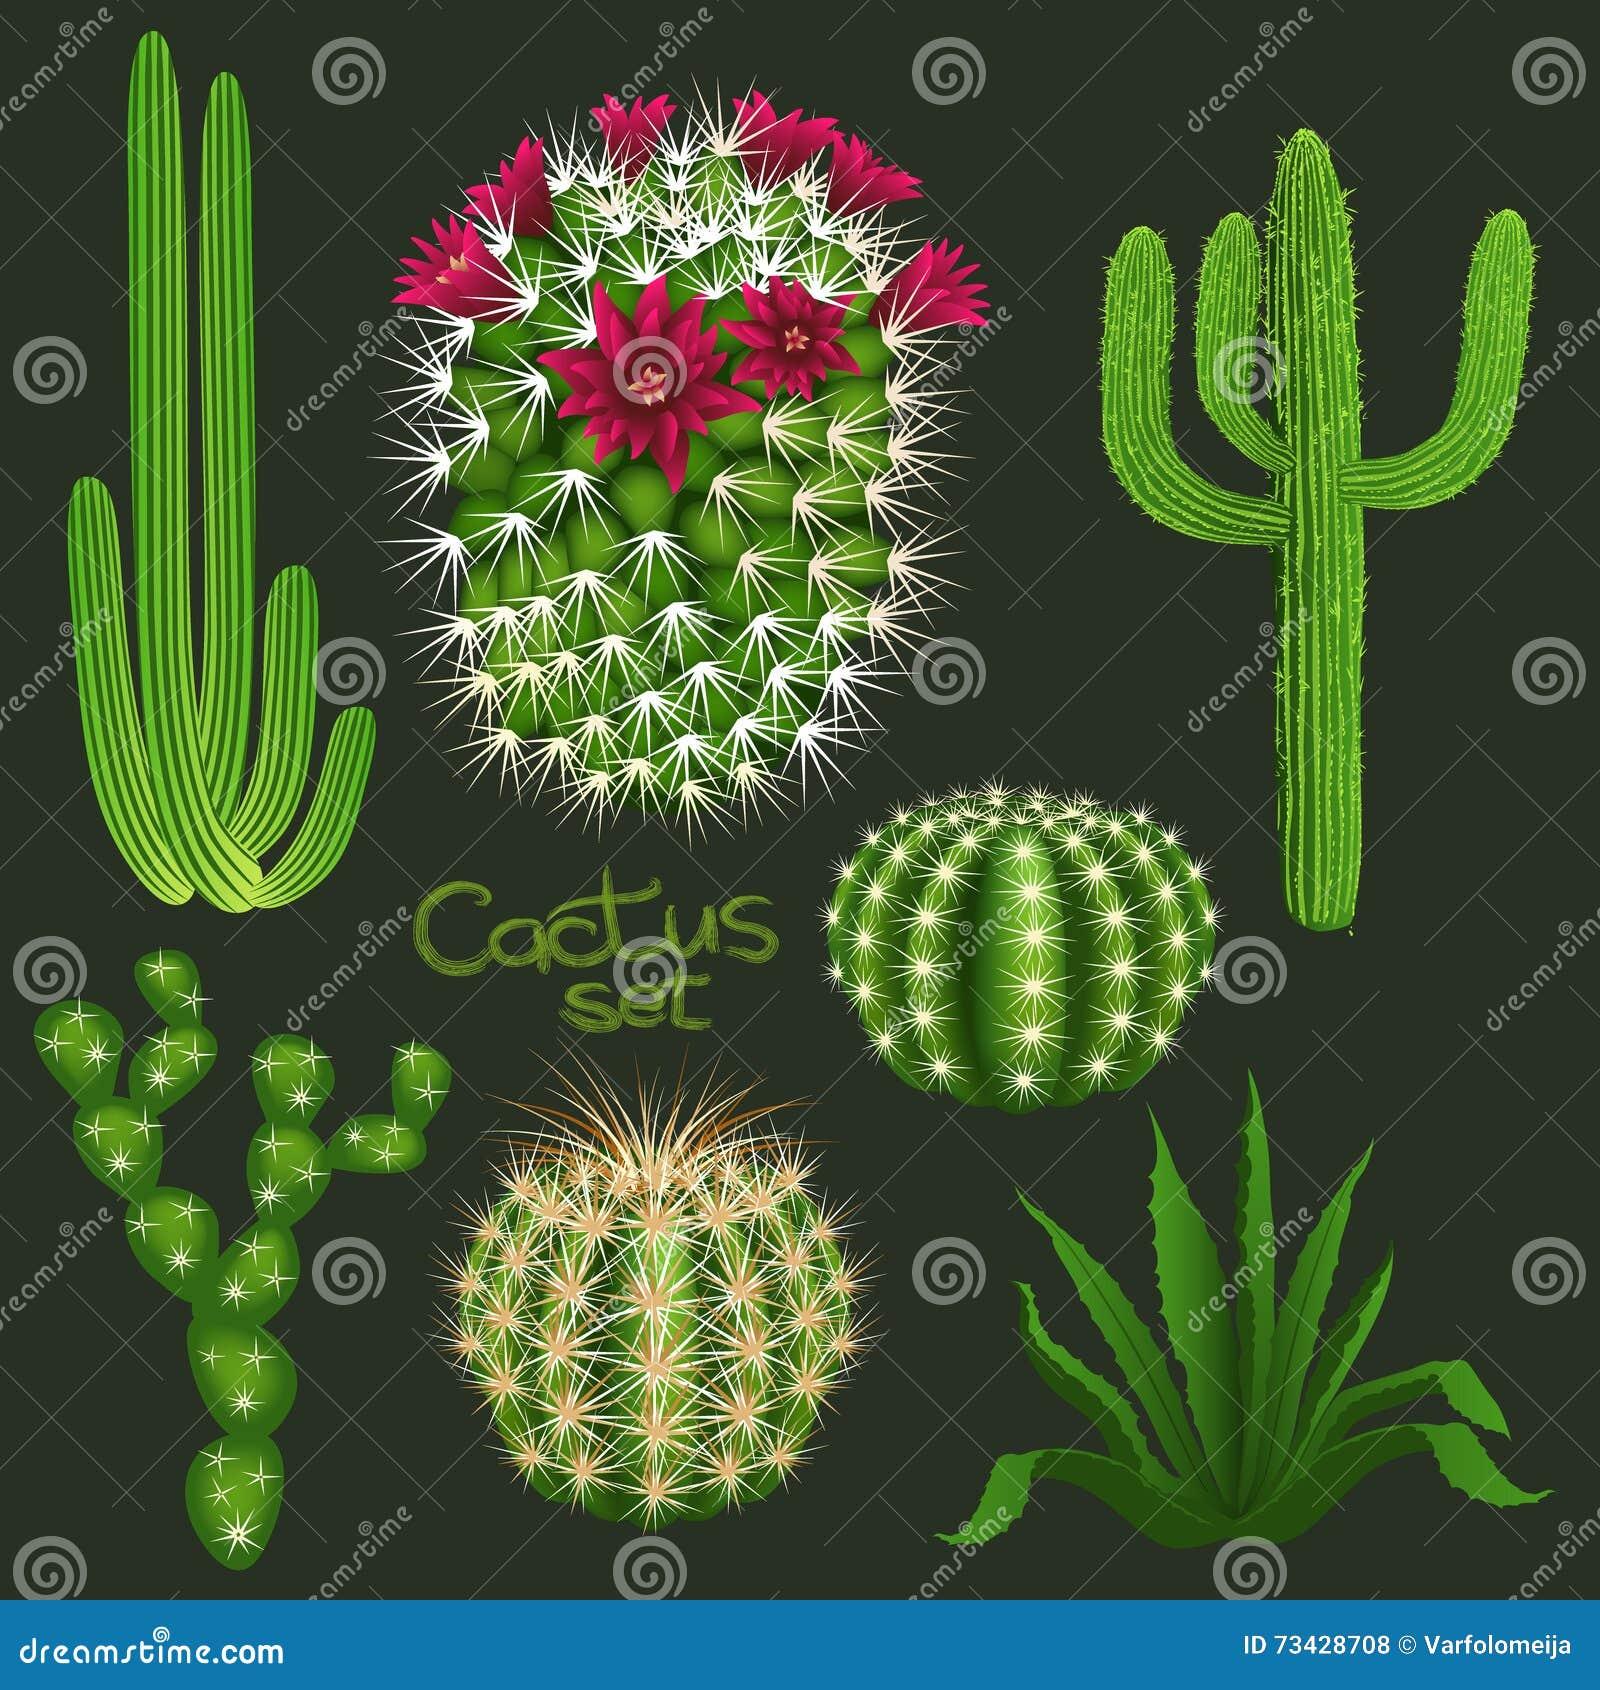 Cactus Realistic Seamless Vector Pattern On Dark